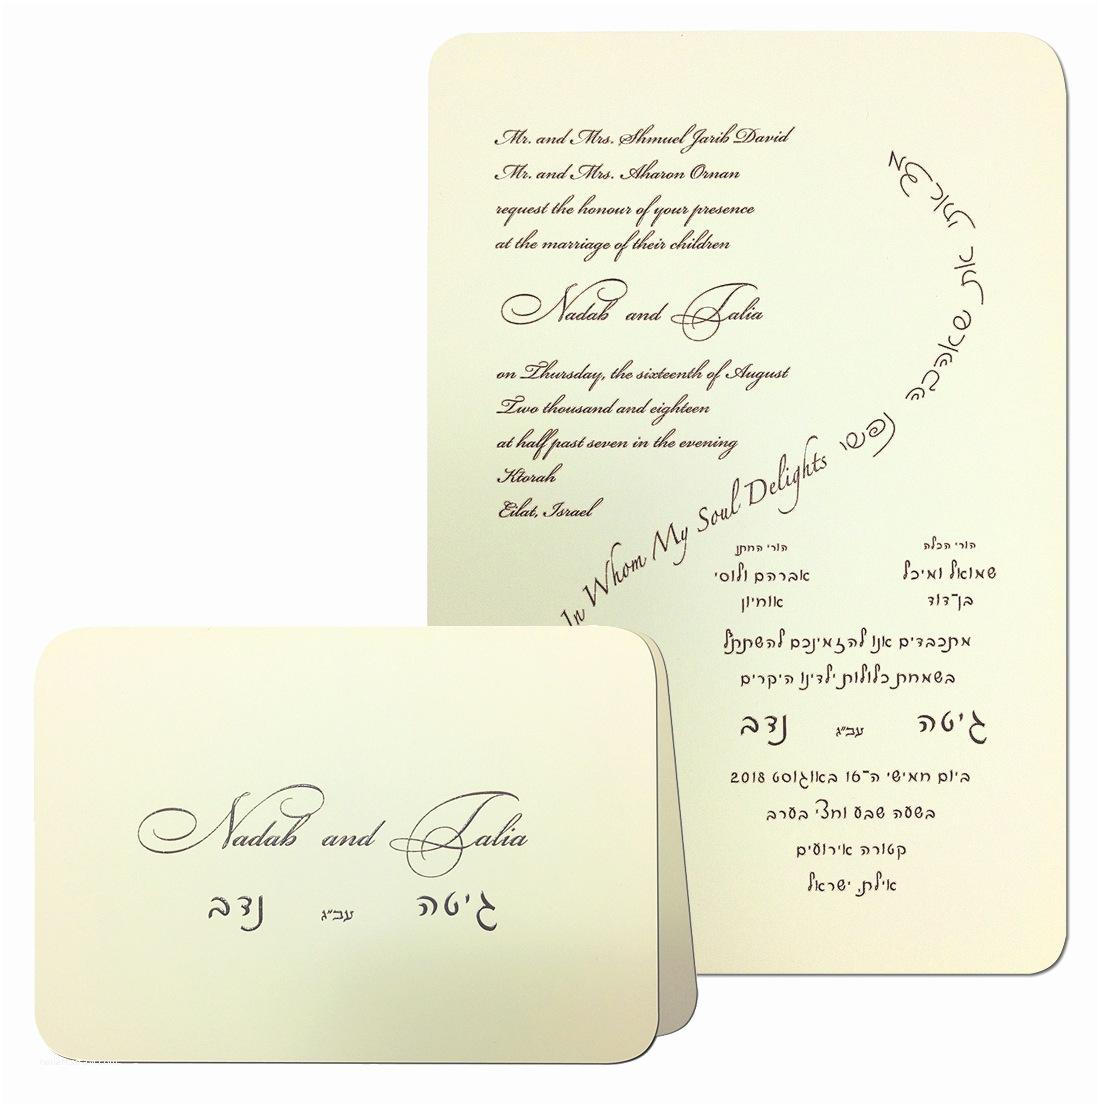 Wholesale Wedding Invitation Albums Krepe Kraft S Gallery Of Wholesale